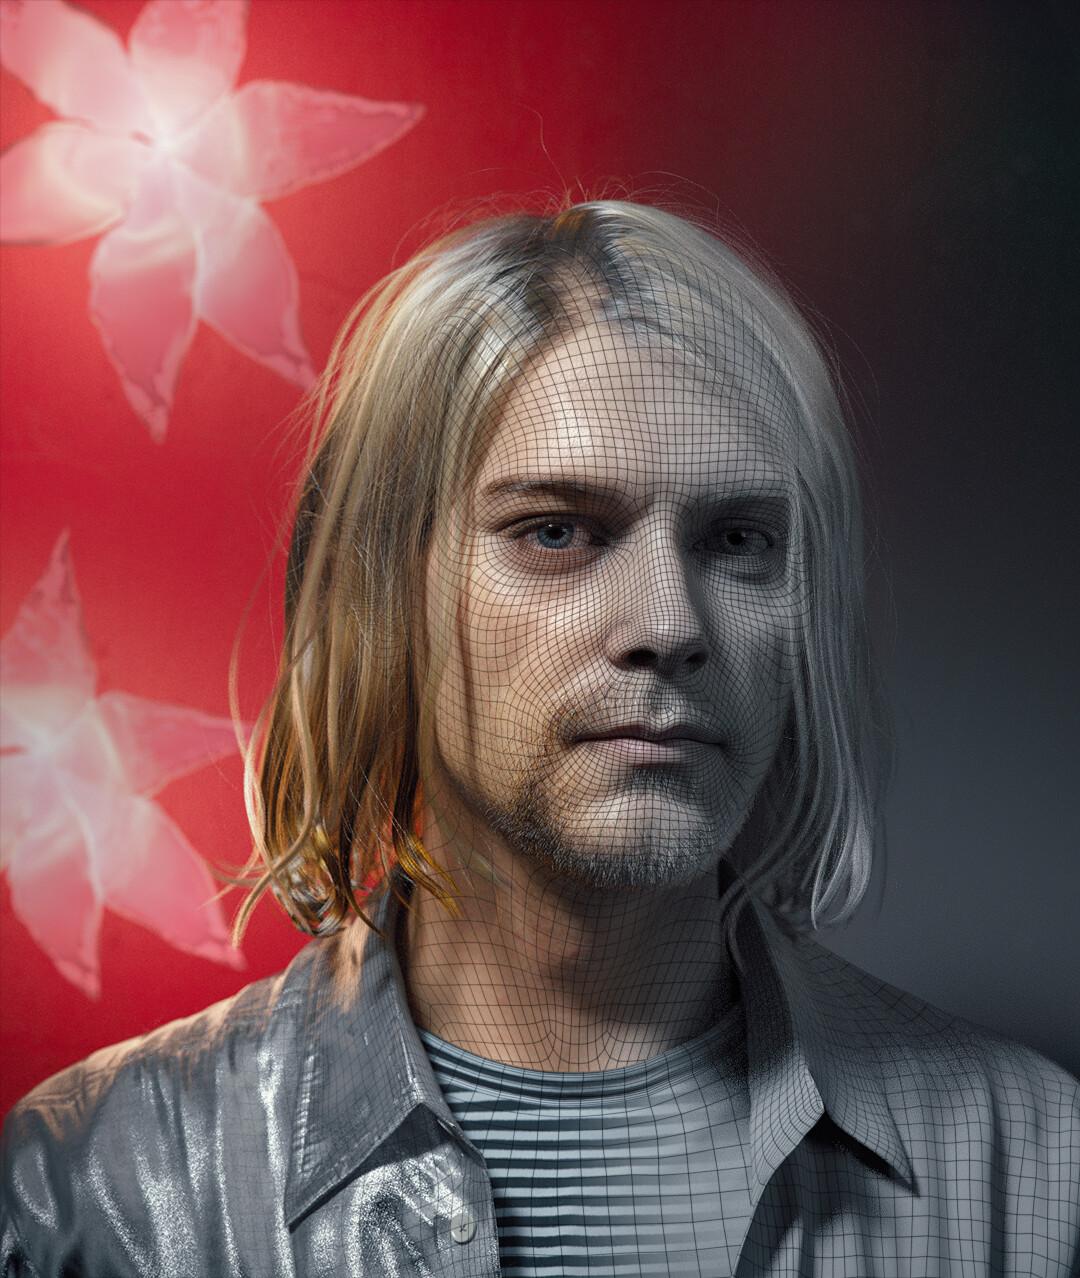 hadi karimi kurt cobain 3d portrait